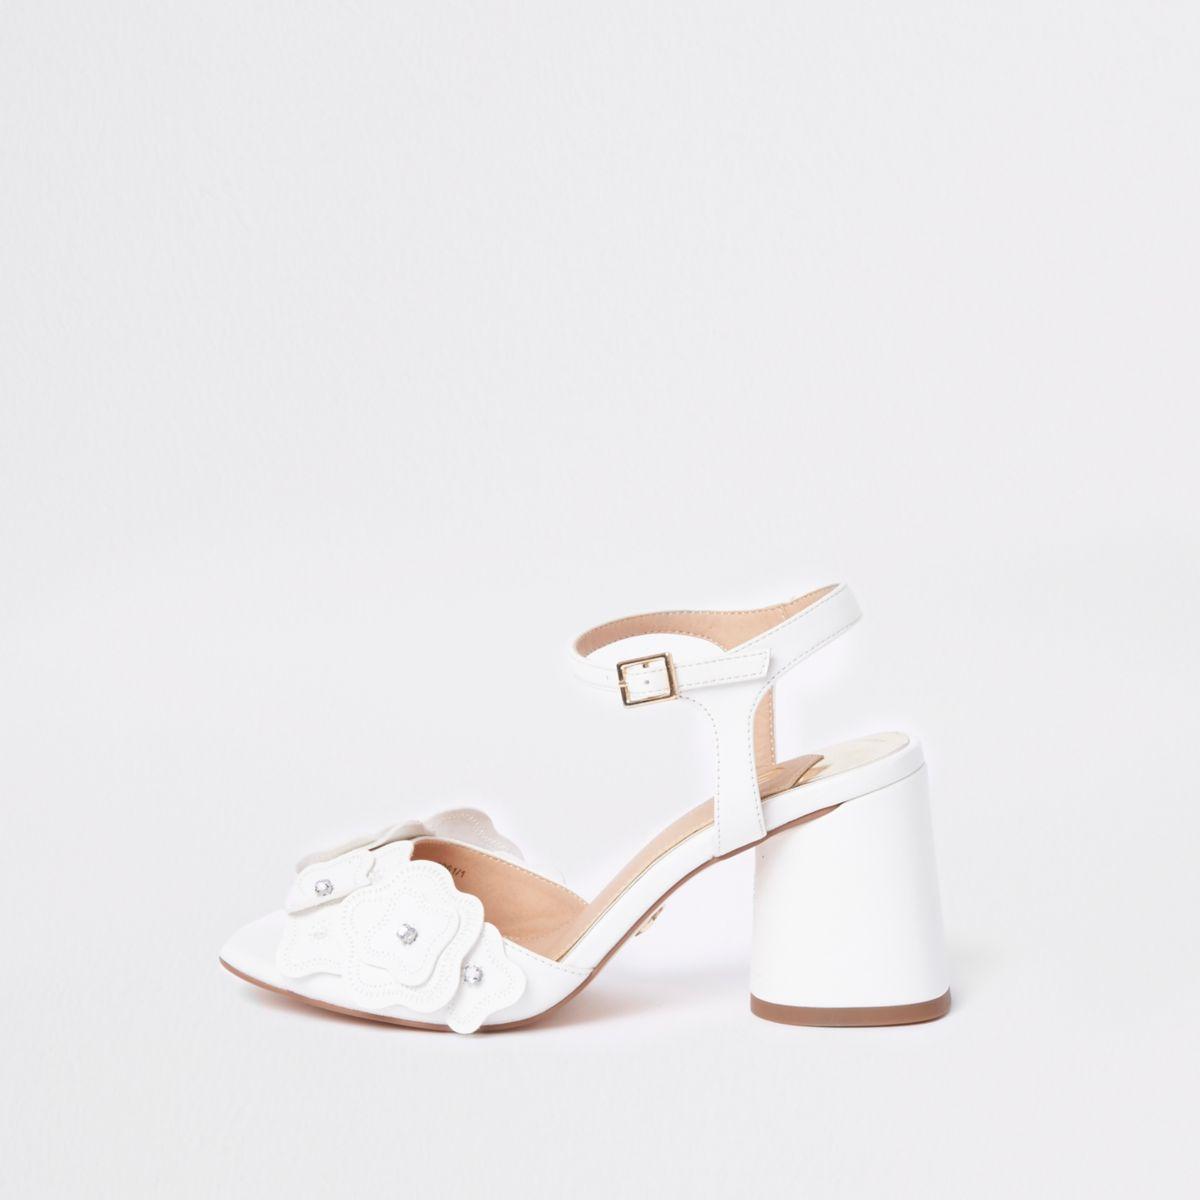 White Rhinestone Flower Block Heel Sandals by River Island